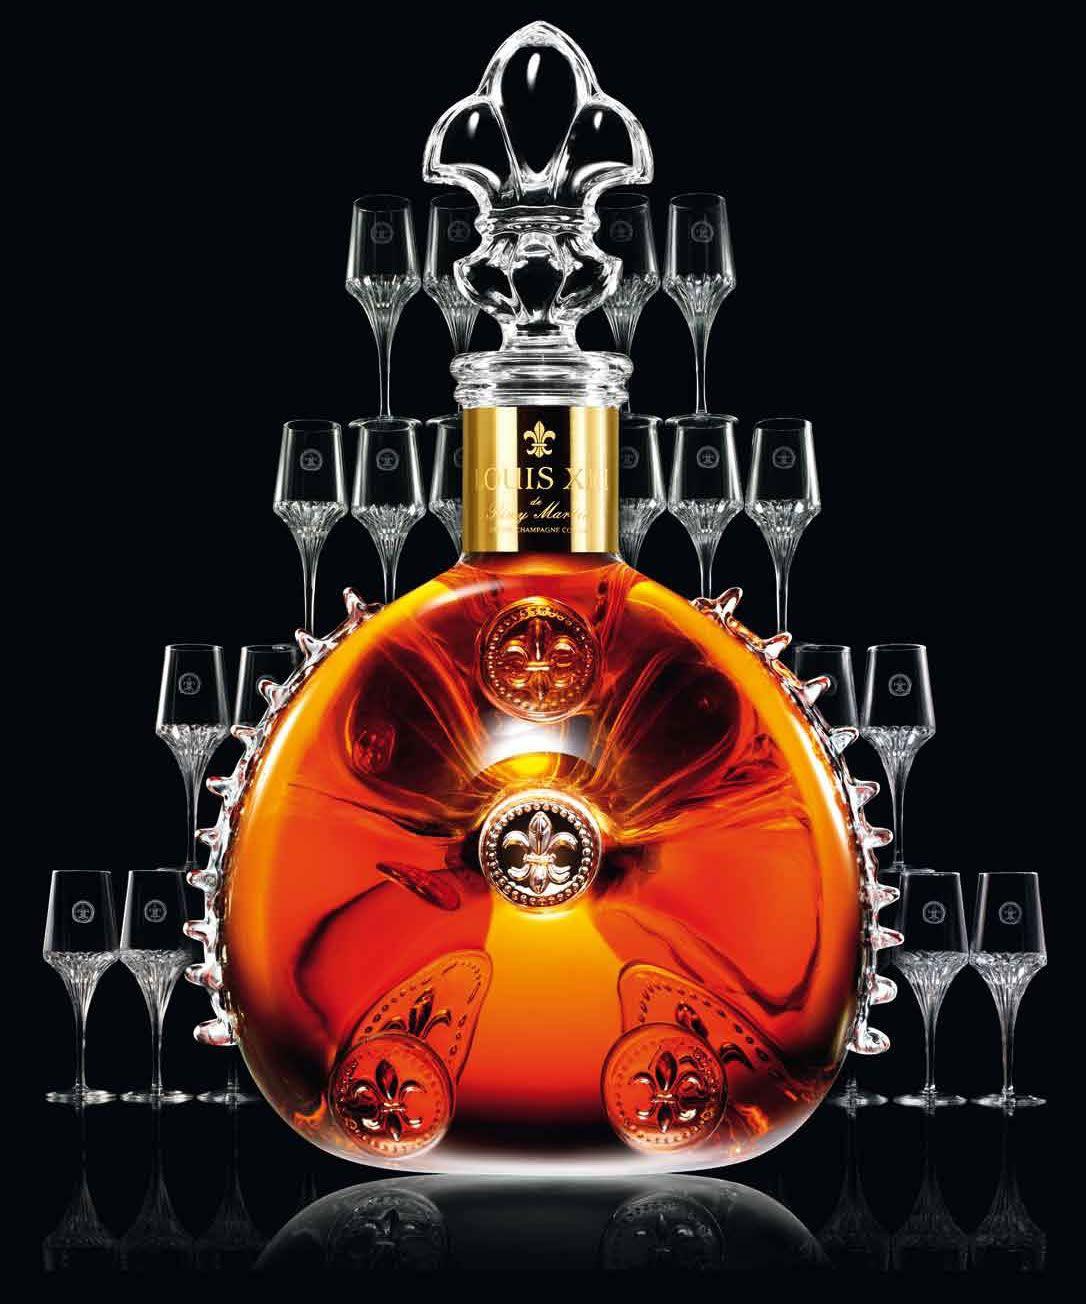 Louis Xiii De Remy Martin Cognac 1 999 99 Best Cognac Louis Xiii Cognac Cognac